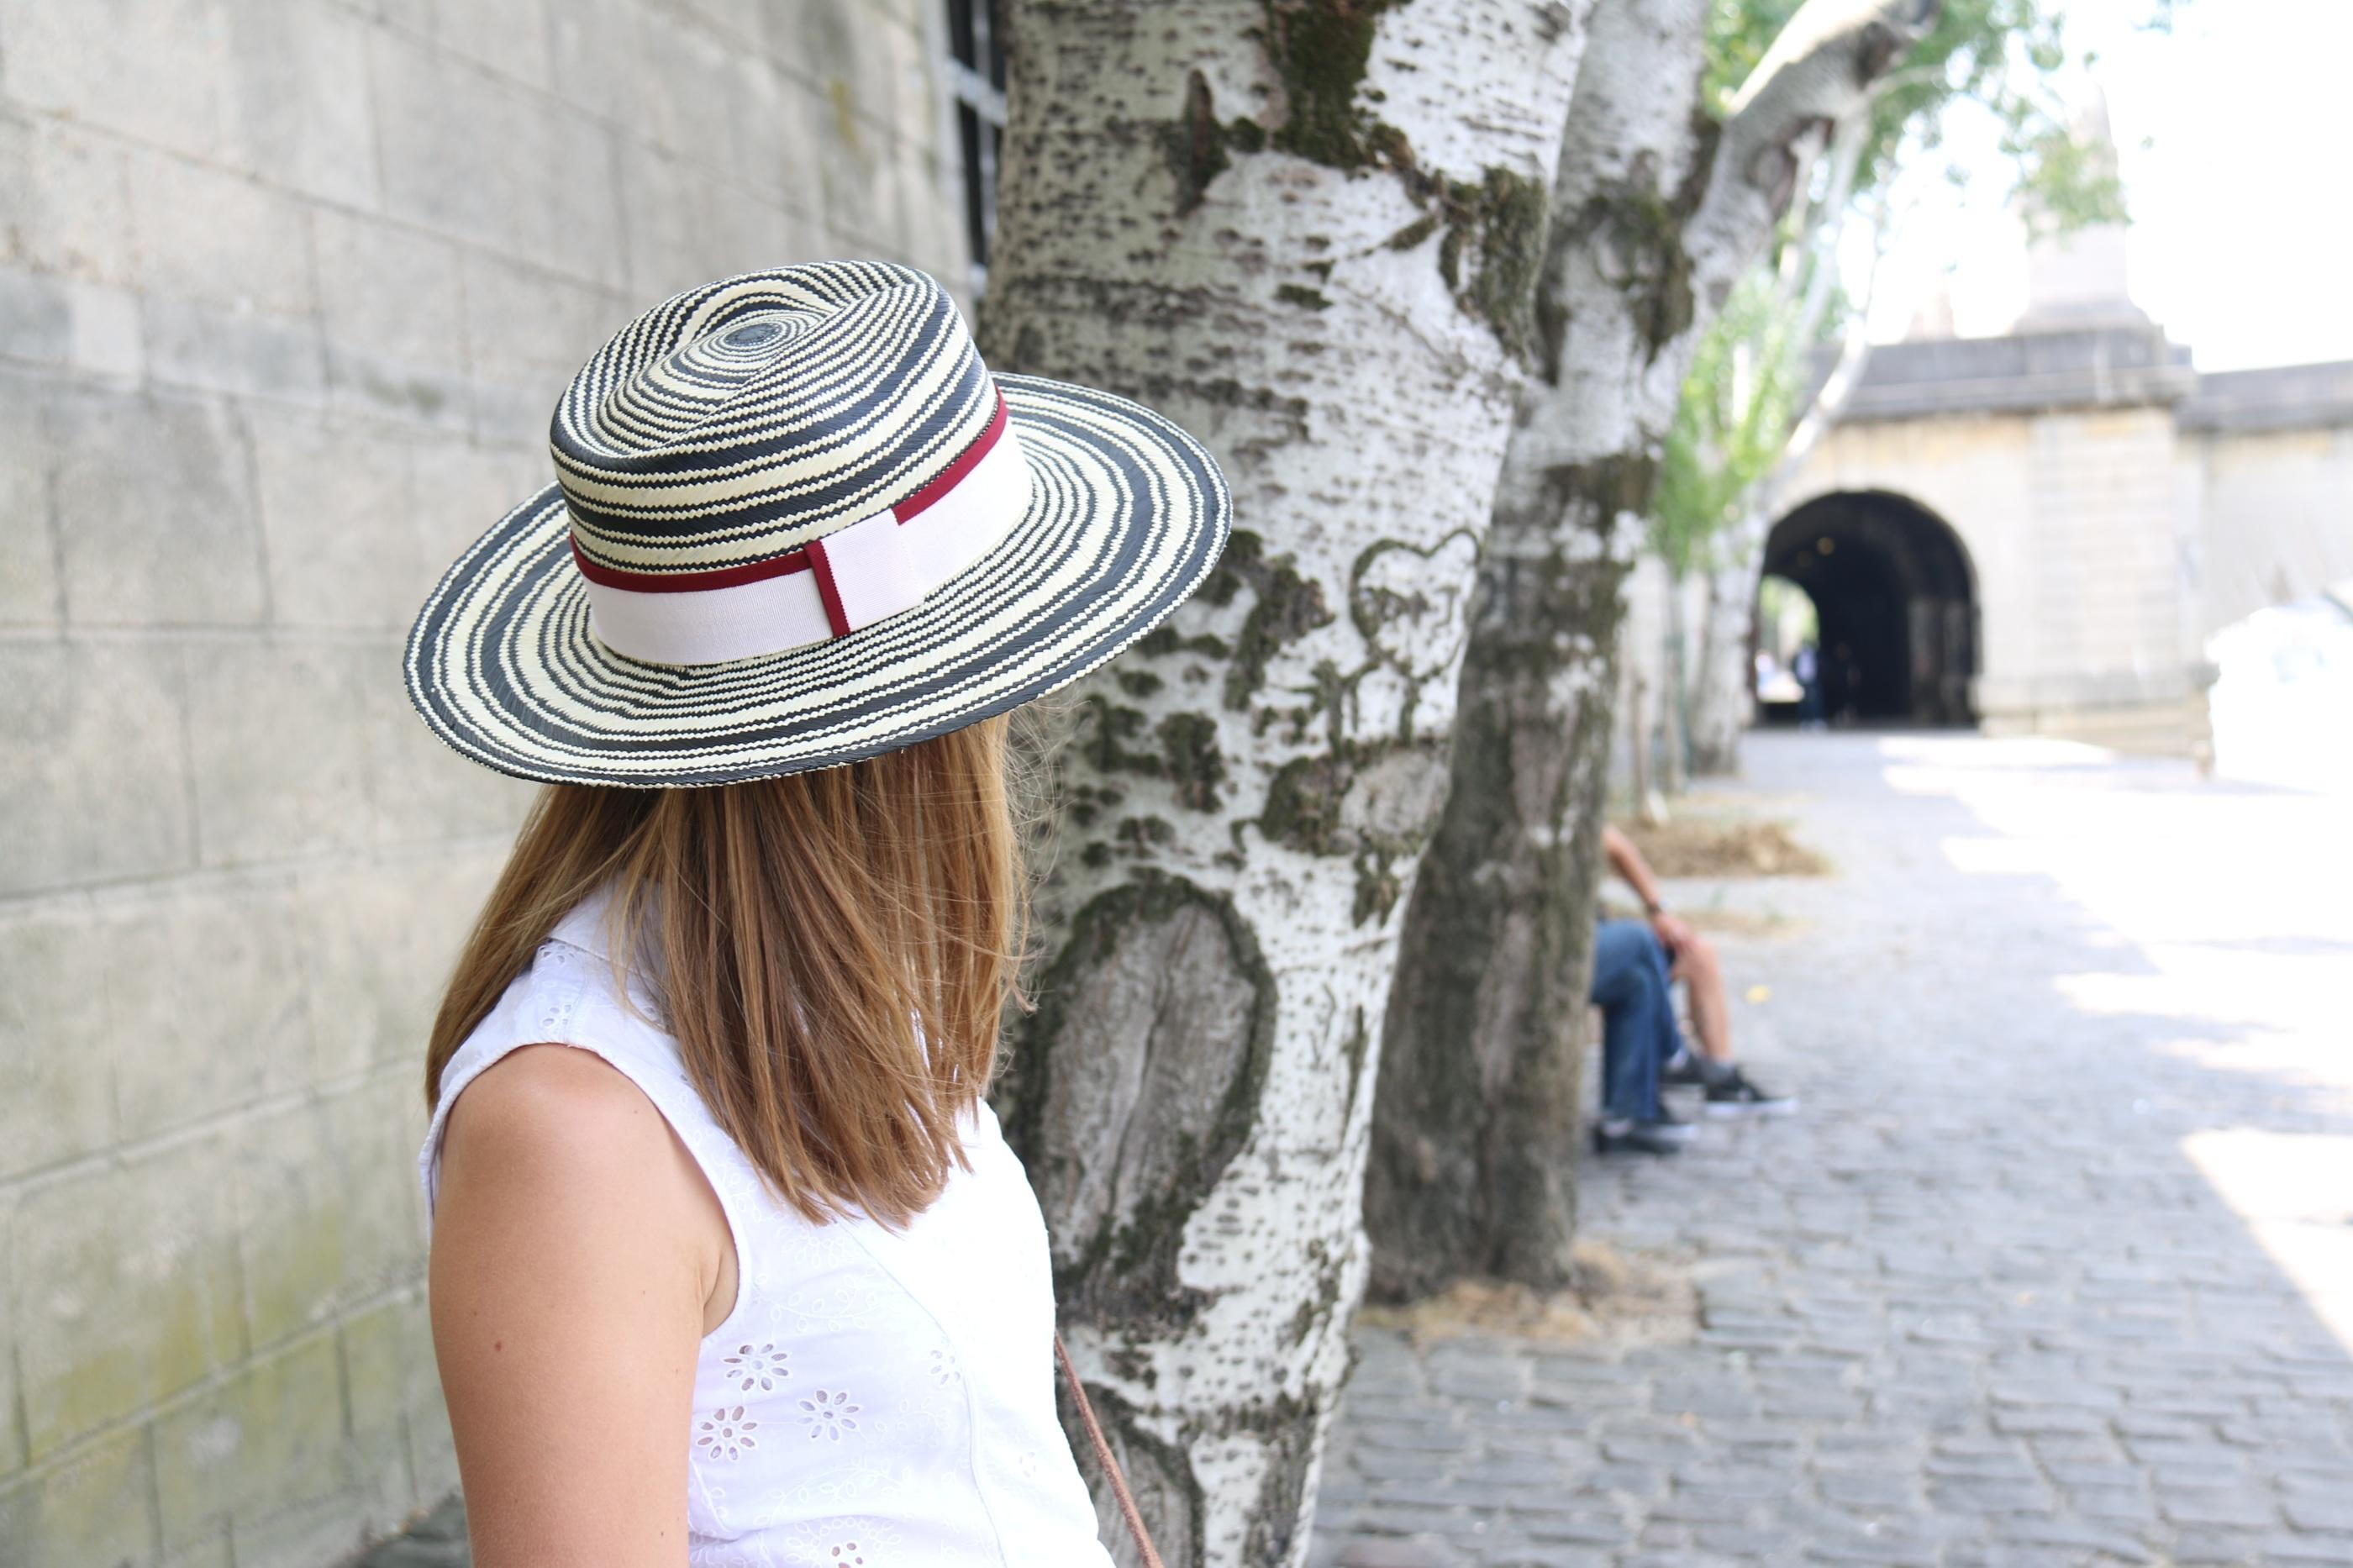 chapeau-panama-saintremy-5-1800x1200